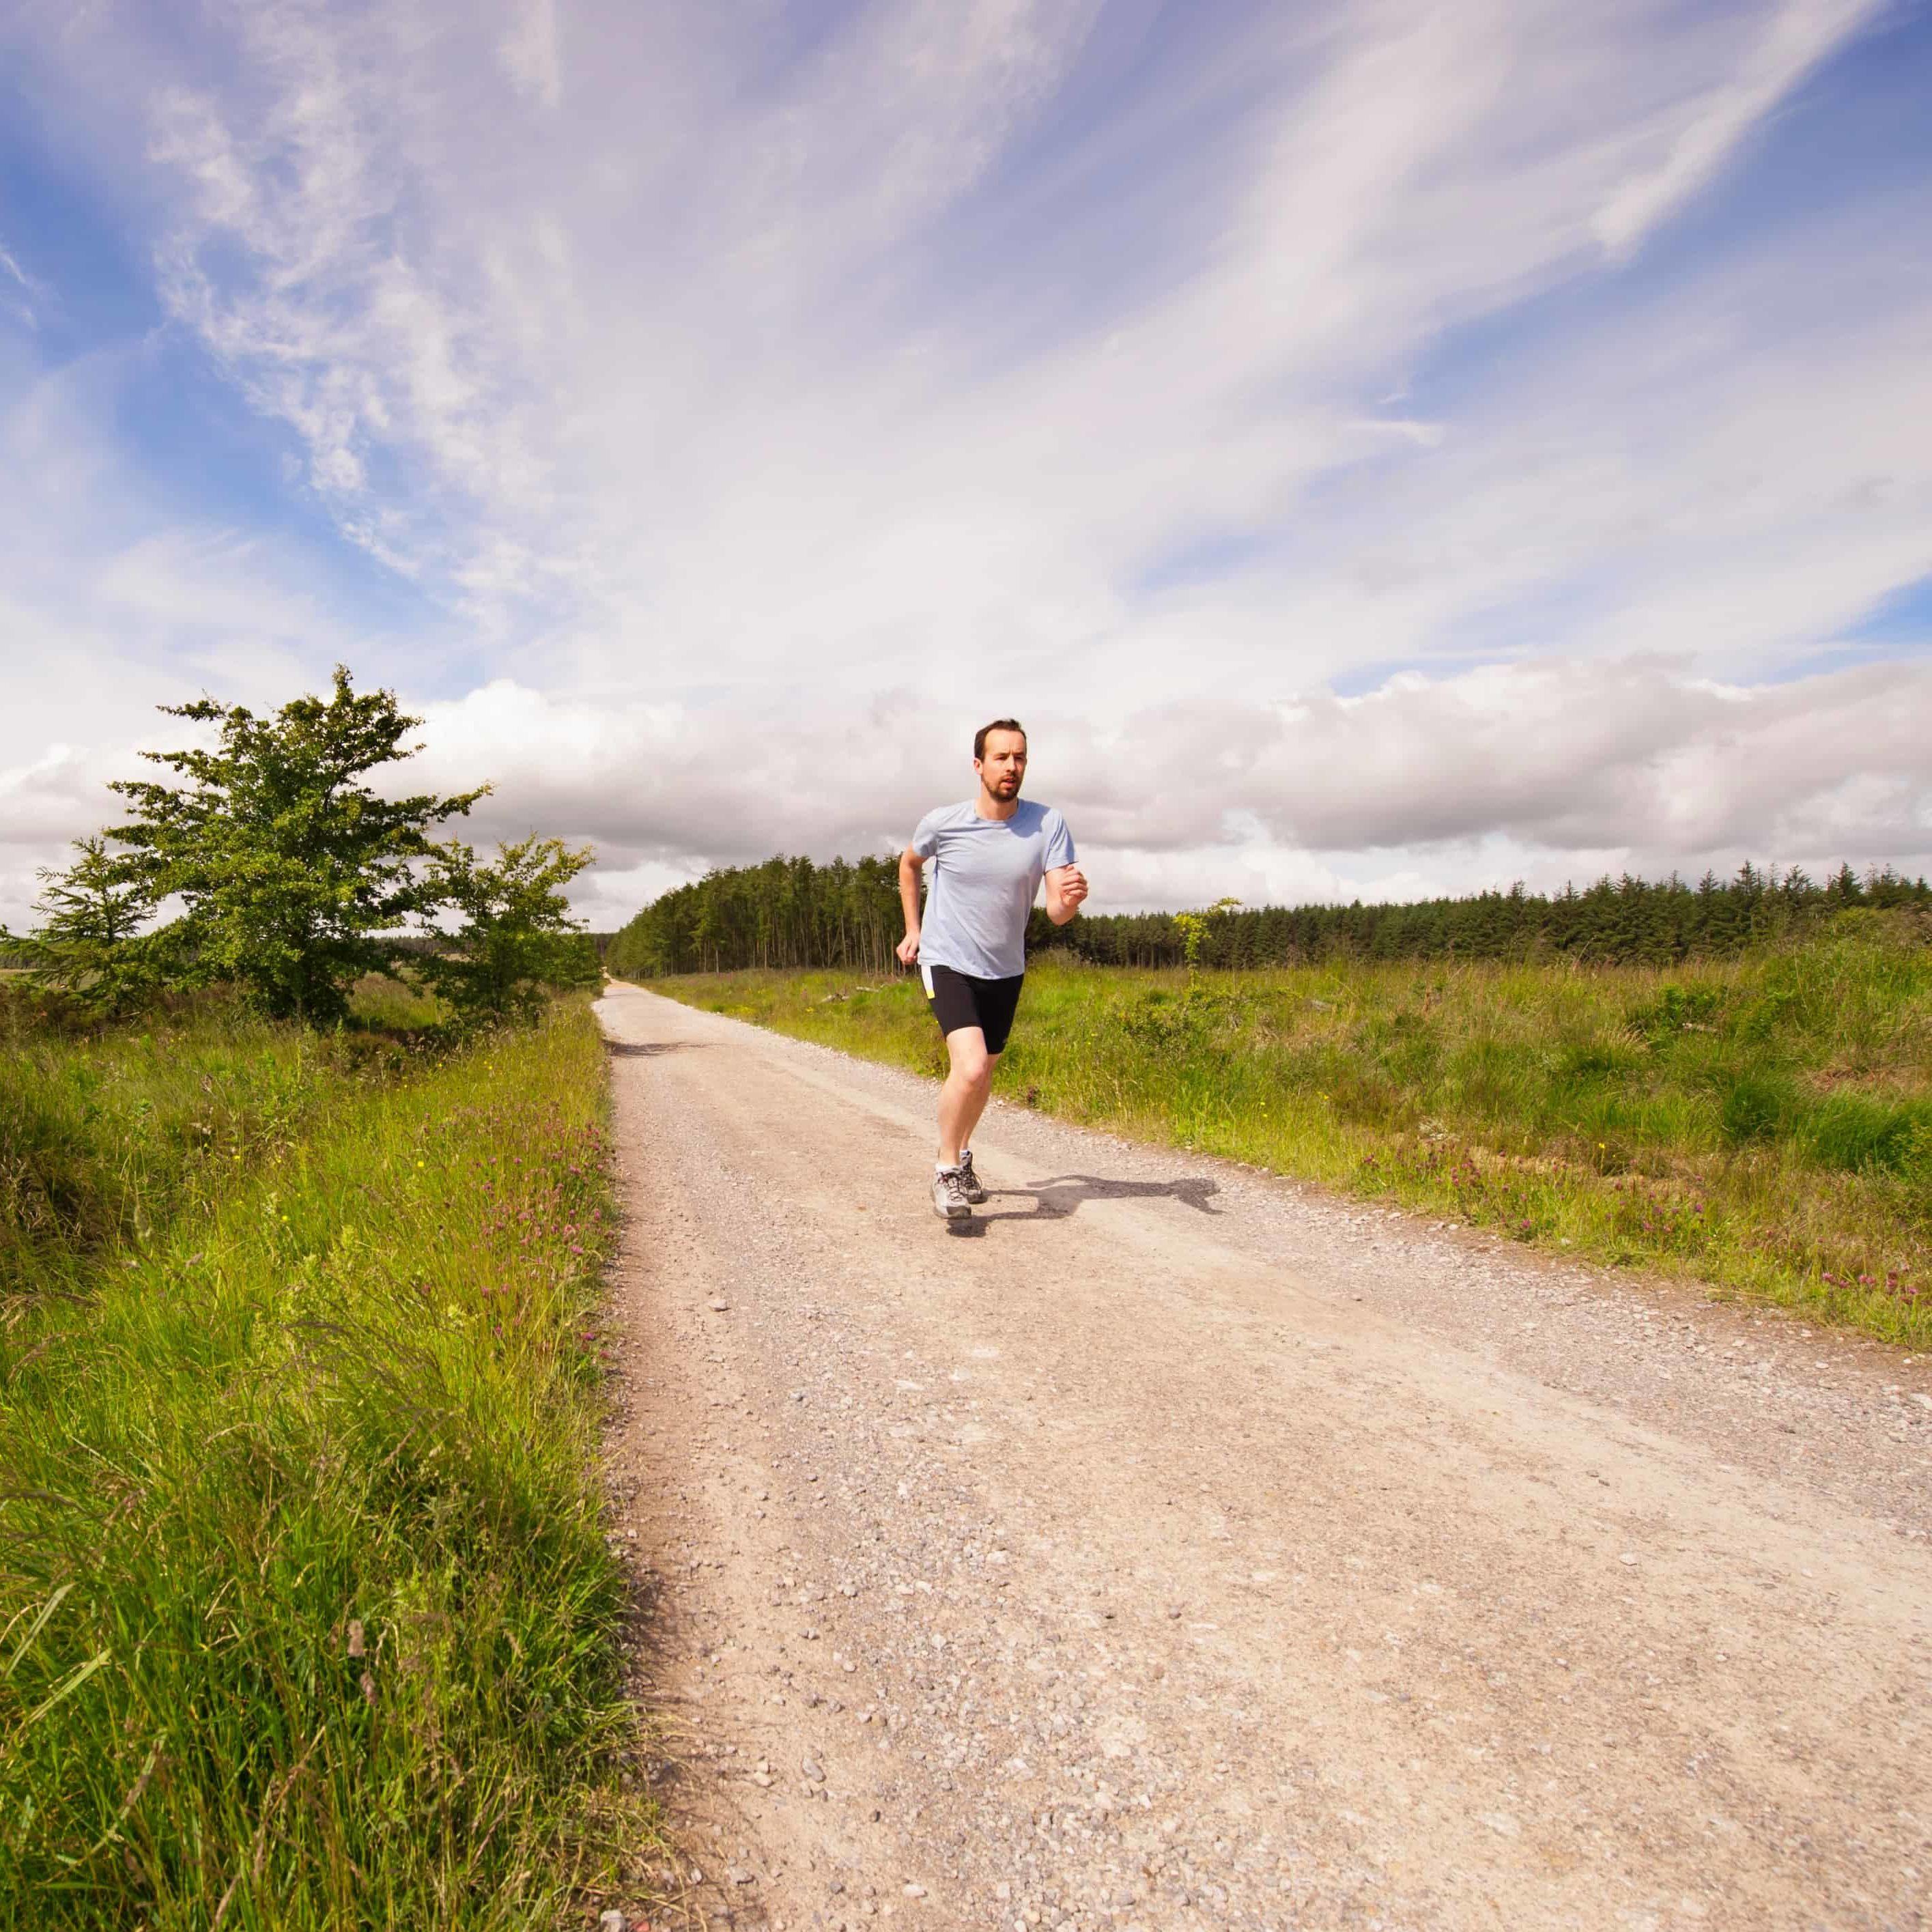 Exercise to Improve Energy